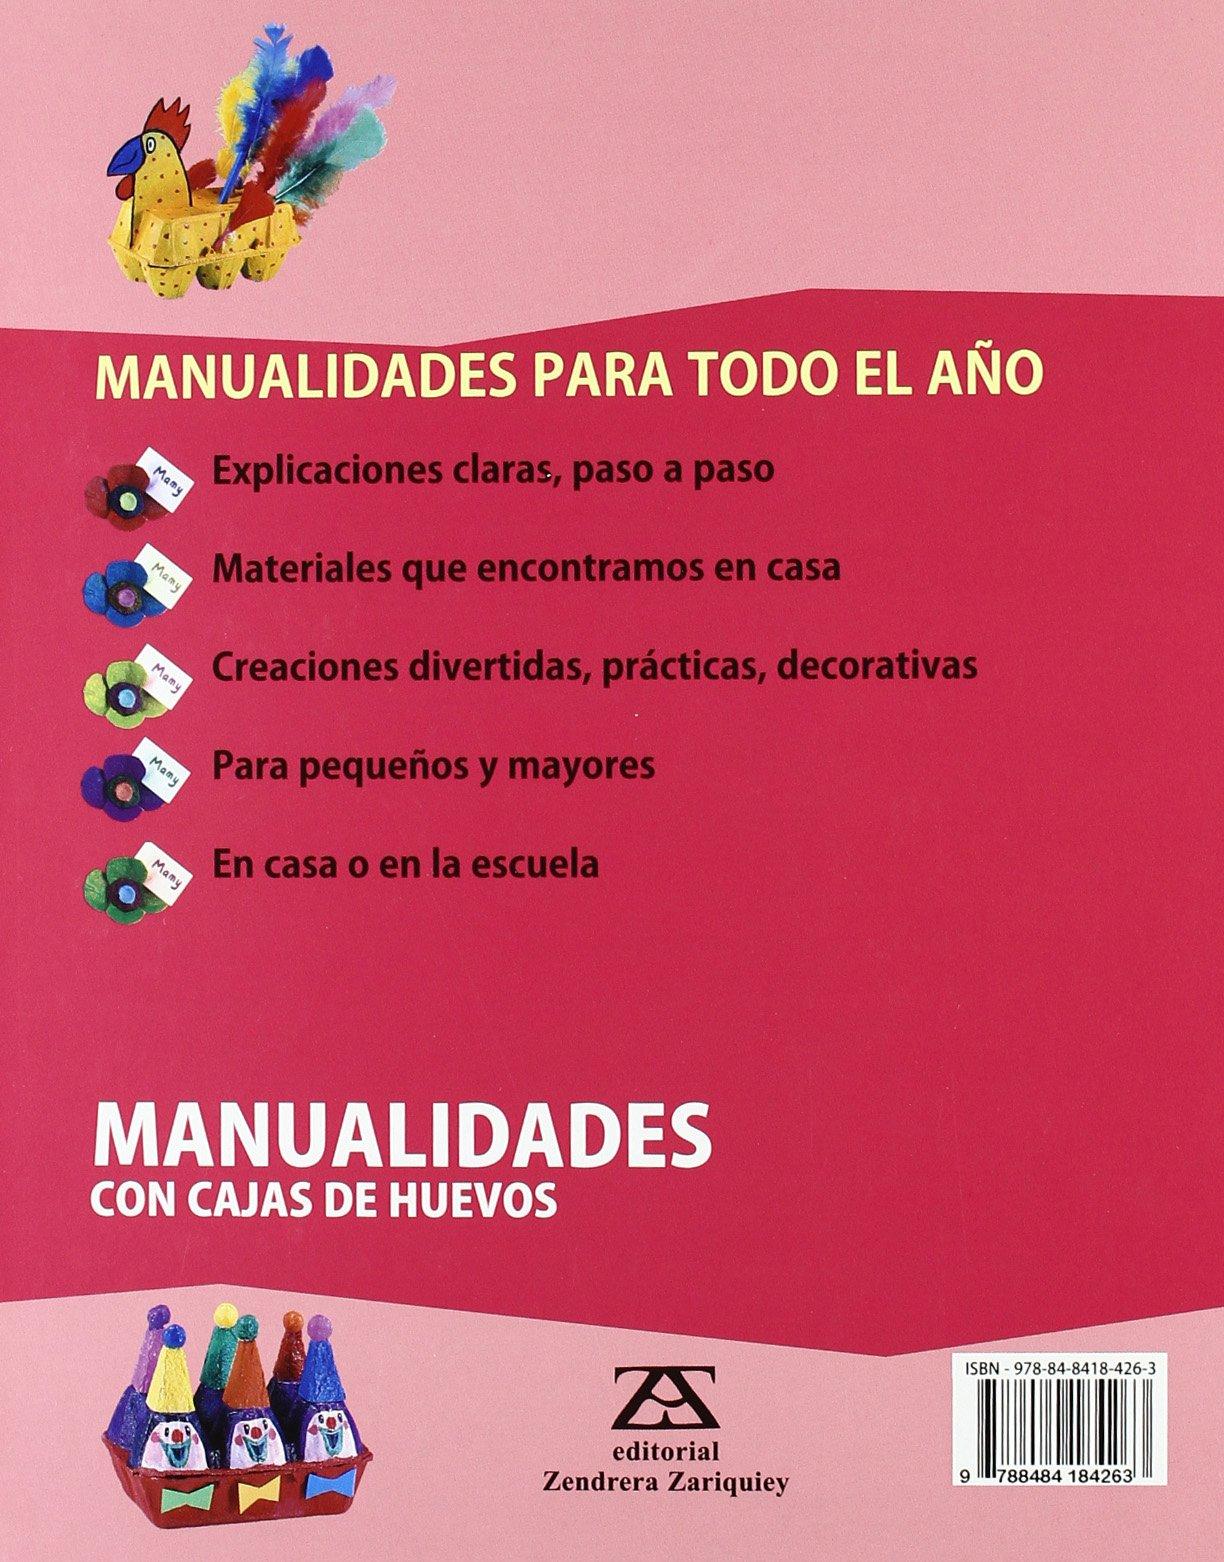 Manualidades con cajas de huevos: Bernadette Theulet-Luzié: 9788484184263: Amazon.com: Books